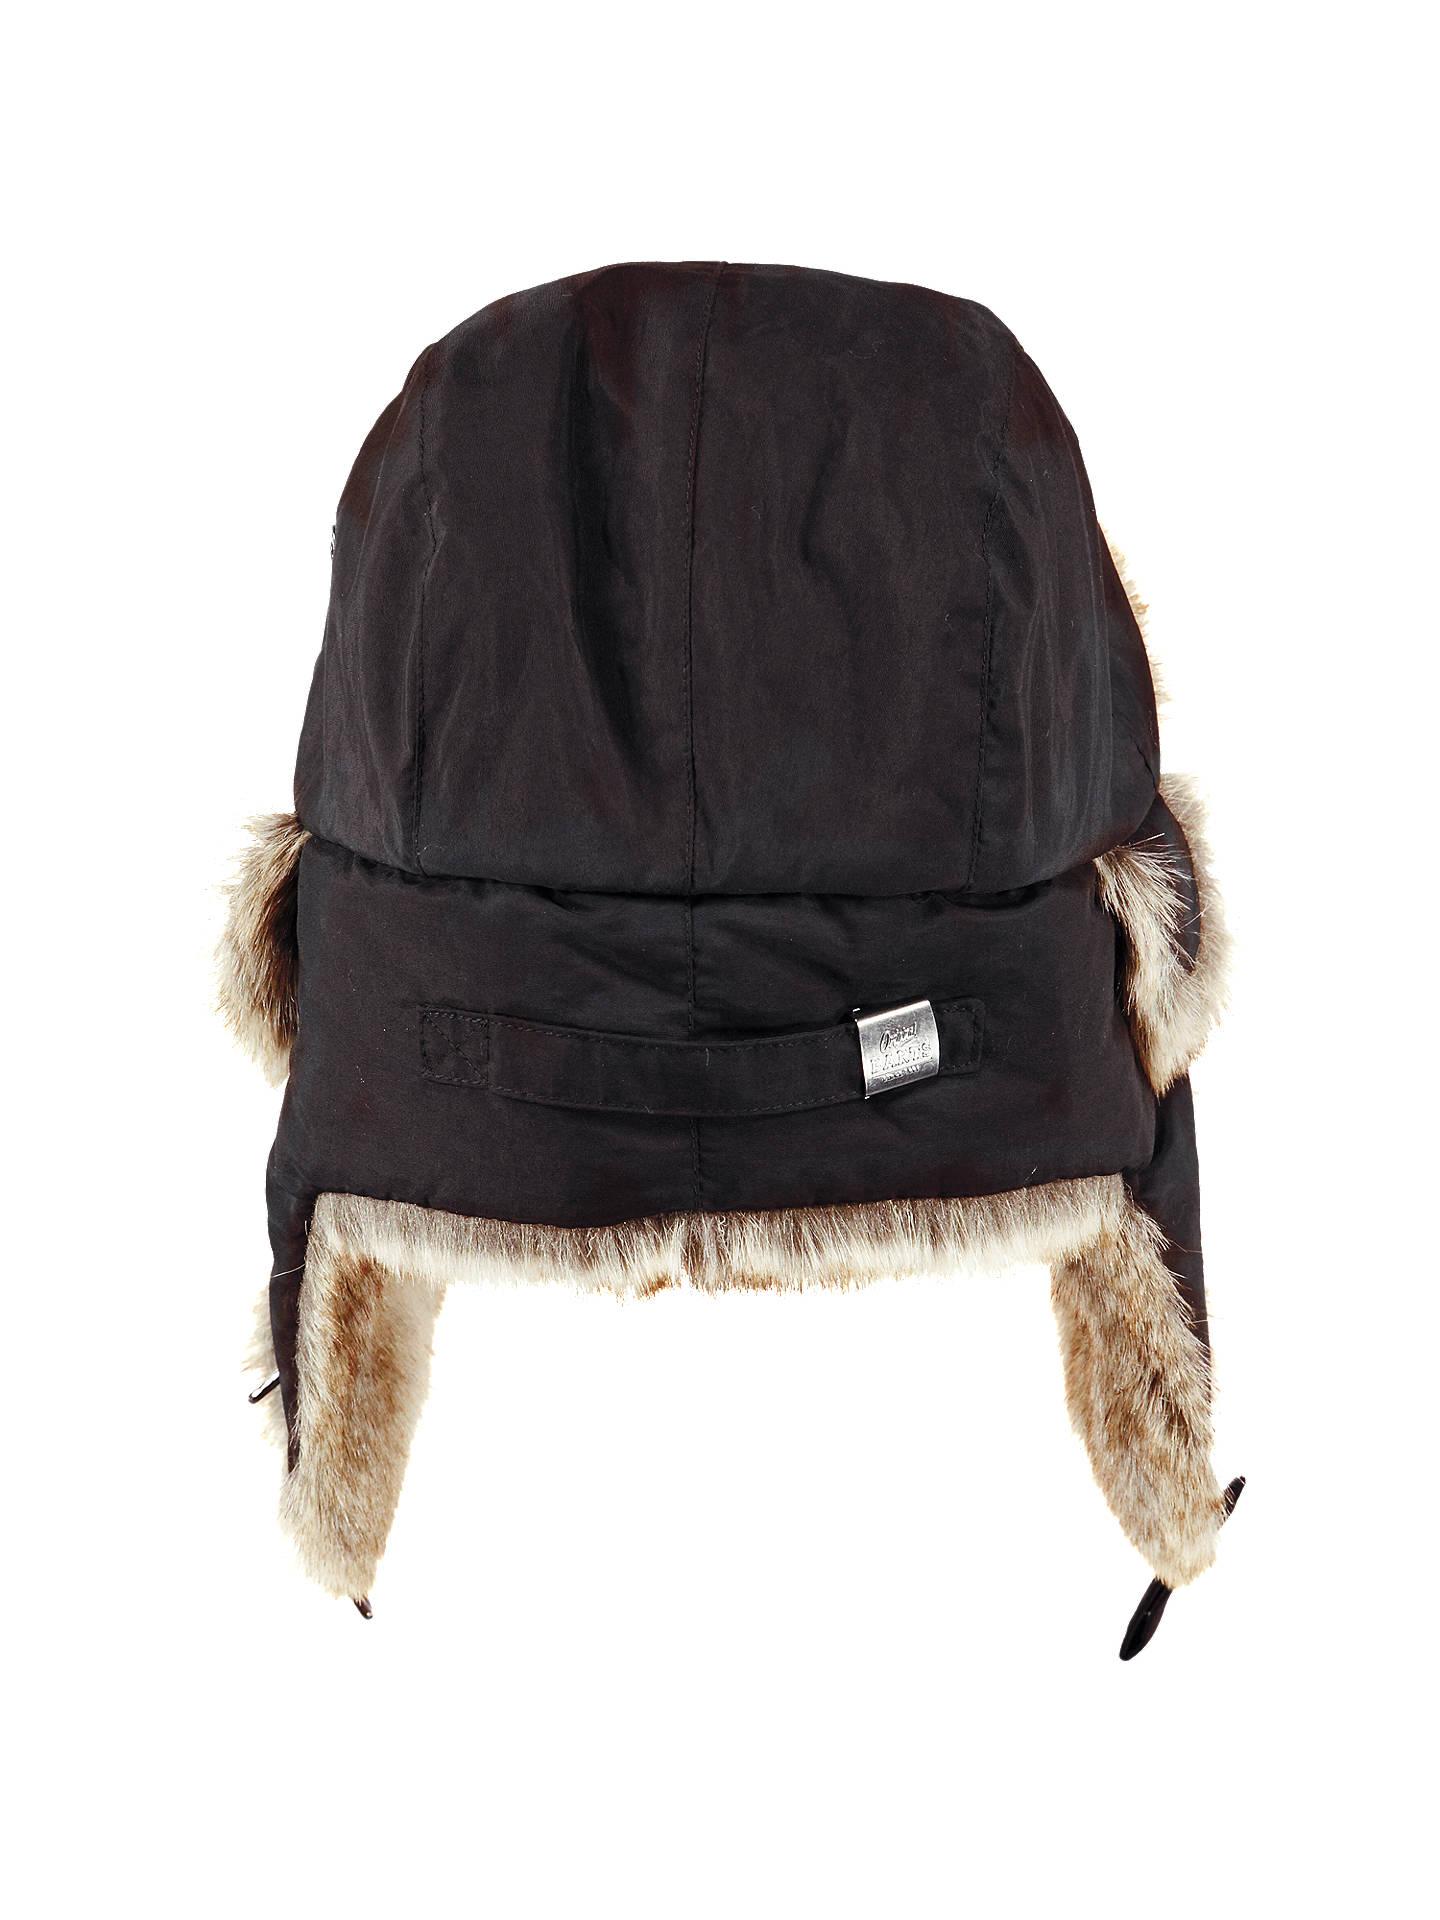 a7f7e648 ... Buy Barts Kamikaze Bomber Hat, One Size, Black Online at johnlewis.com  ...